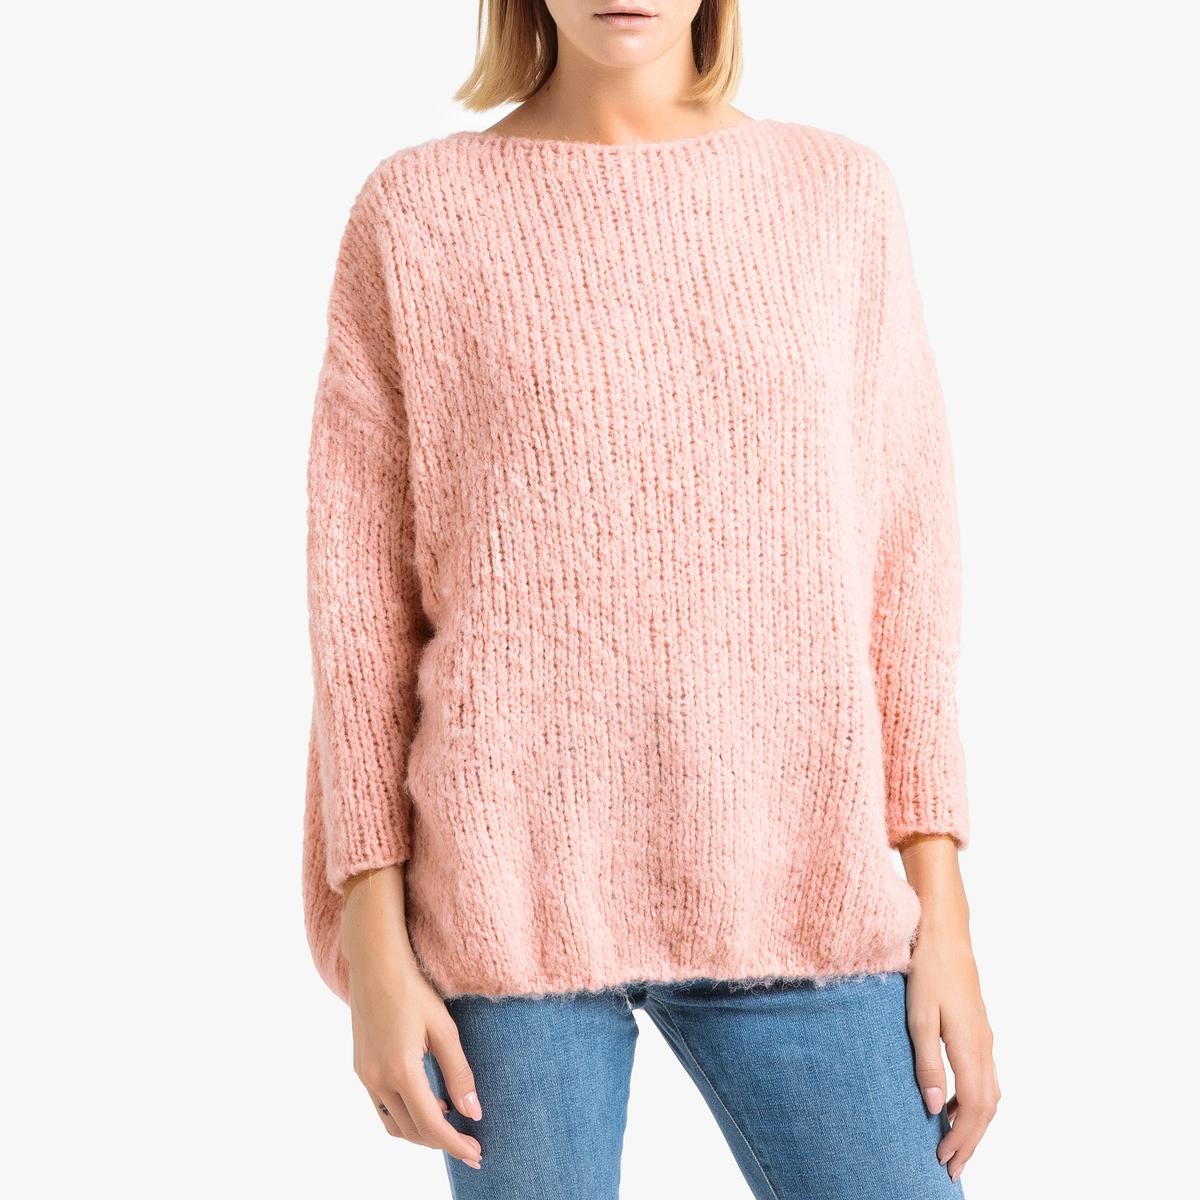 Пуловер La Redoute С вырезом-лодочкой из трикотажа BOOLDER M/L розовый пуловер la redoute с вырезом лодочкой из тонкого трикотажа m красный